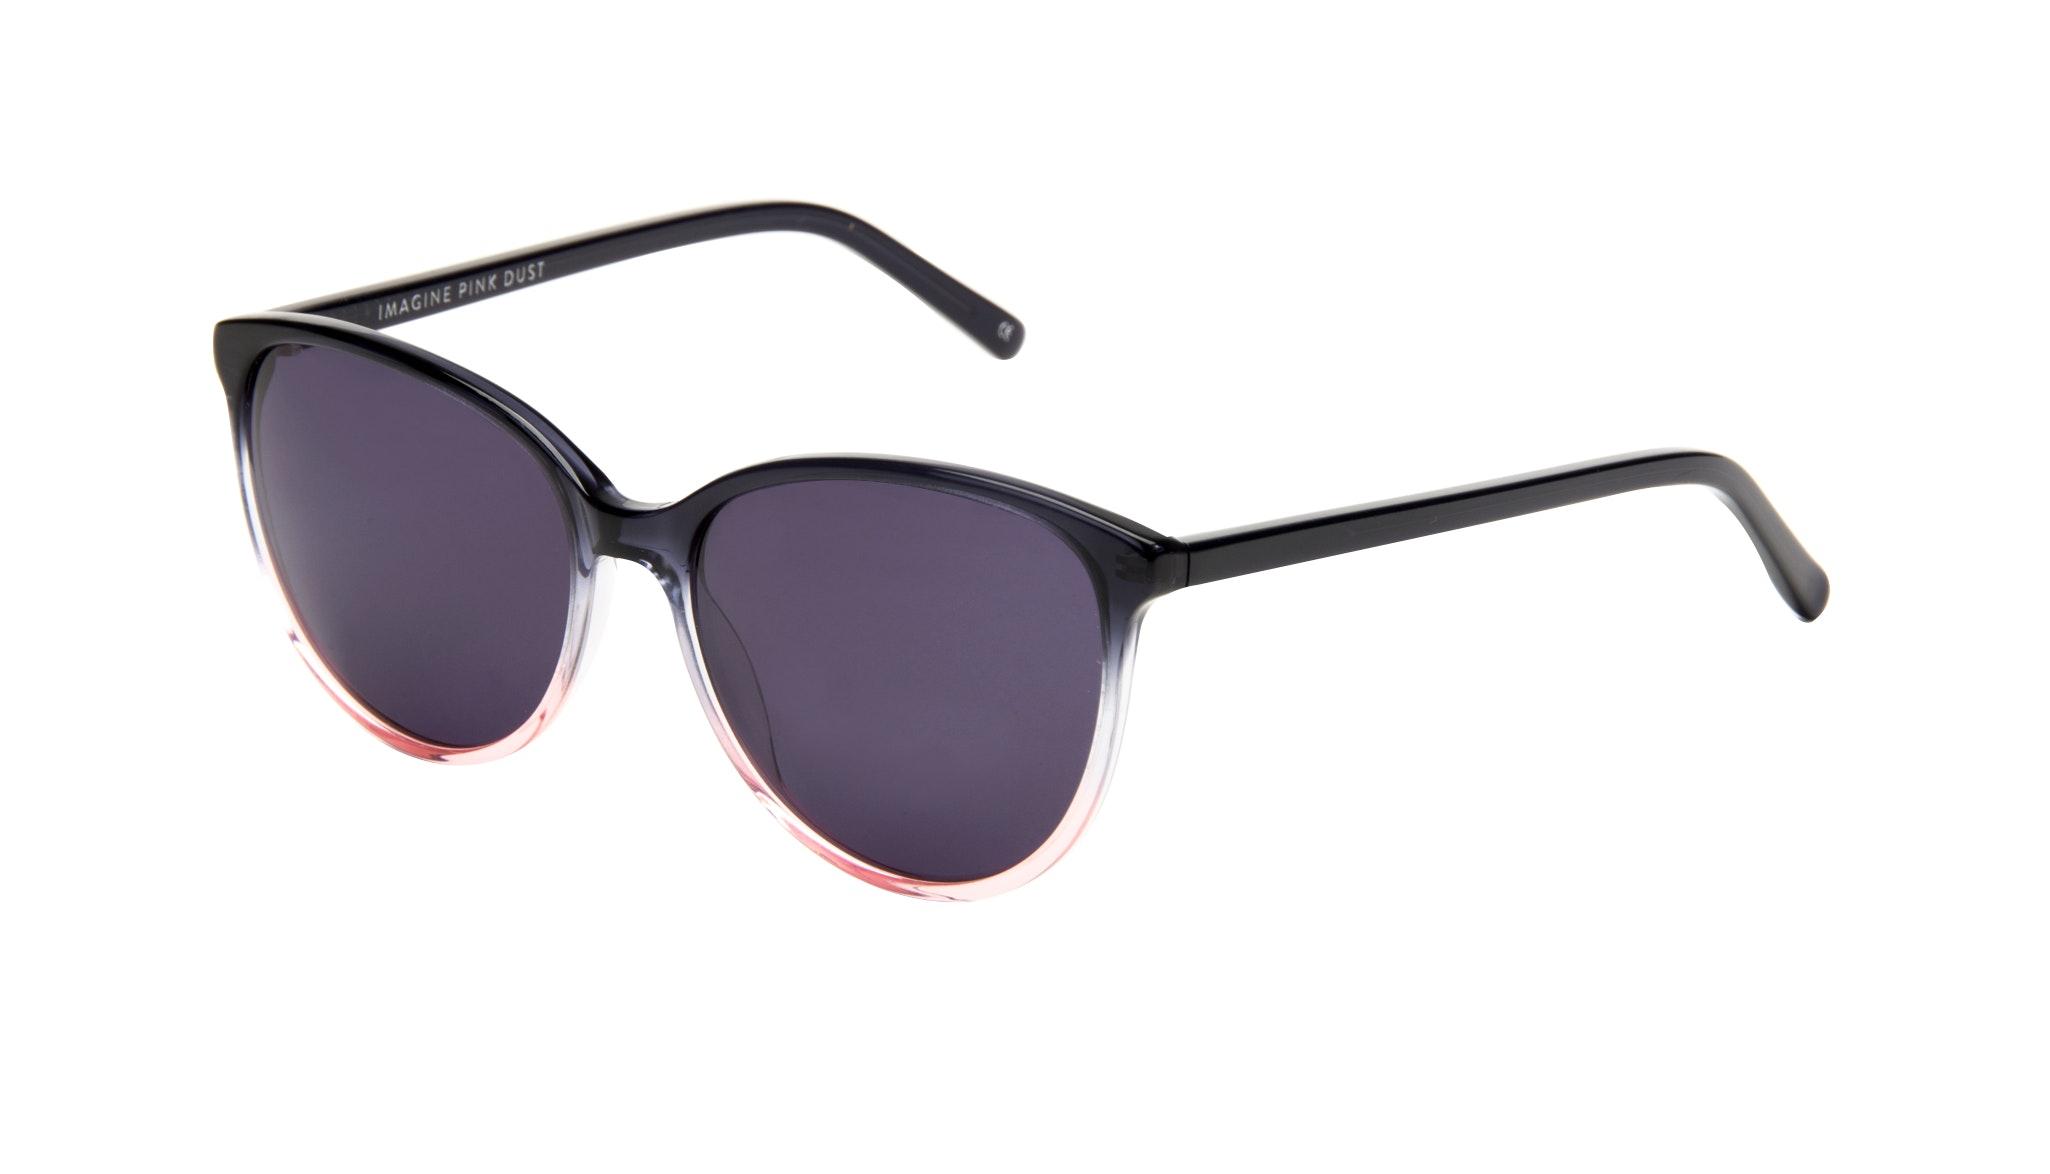 Affordable Fashion Glasses Cat Eye Round Sunglasses Women Imagine Pink Dust Tilt